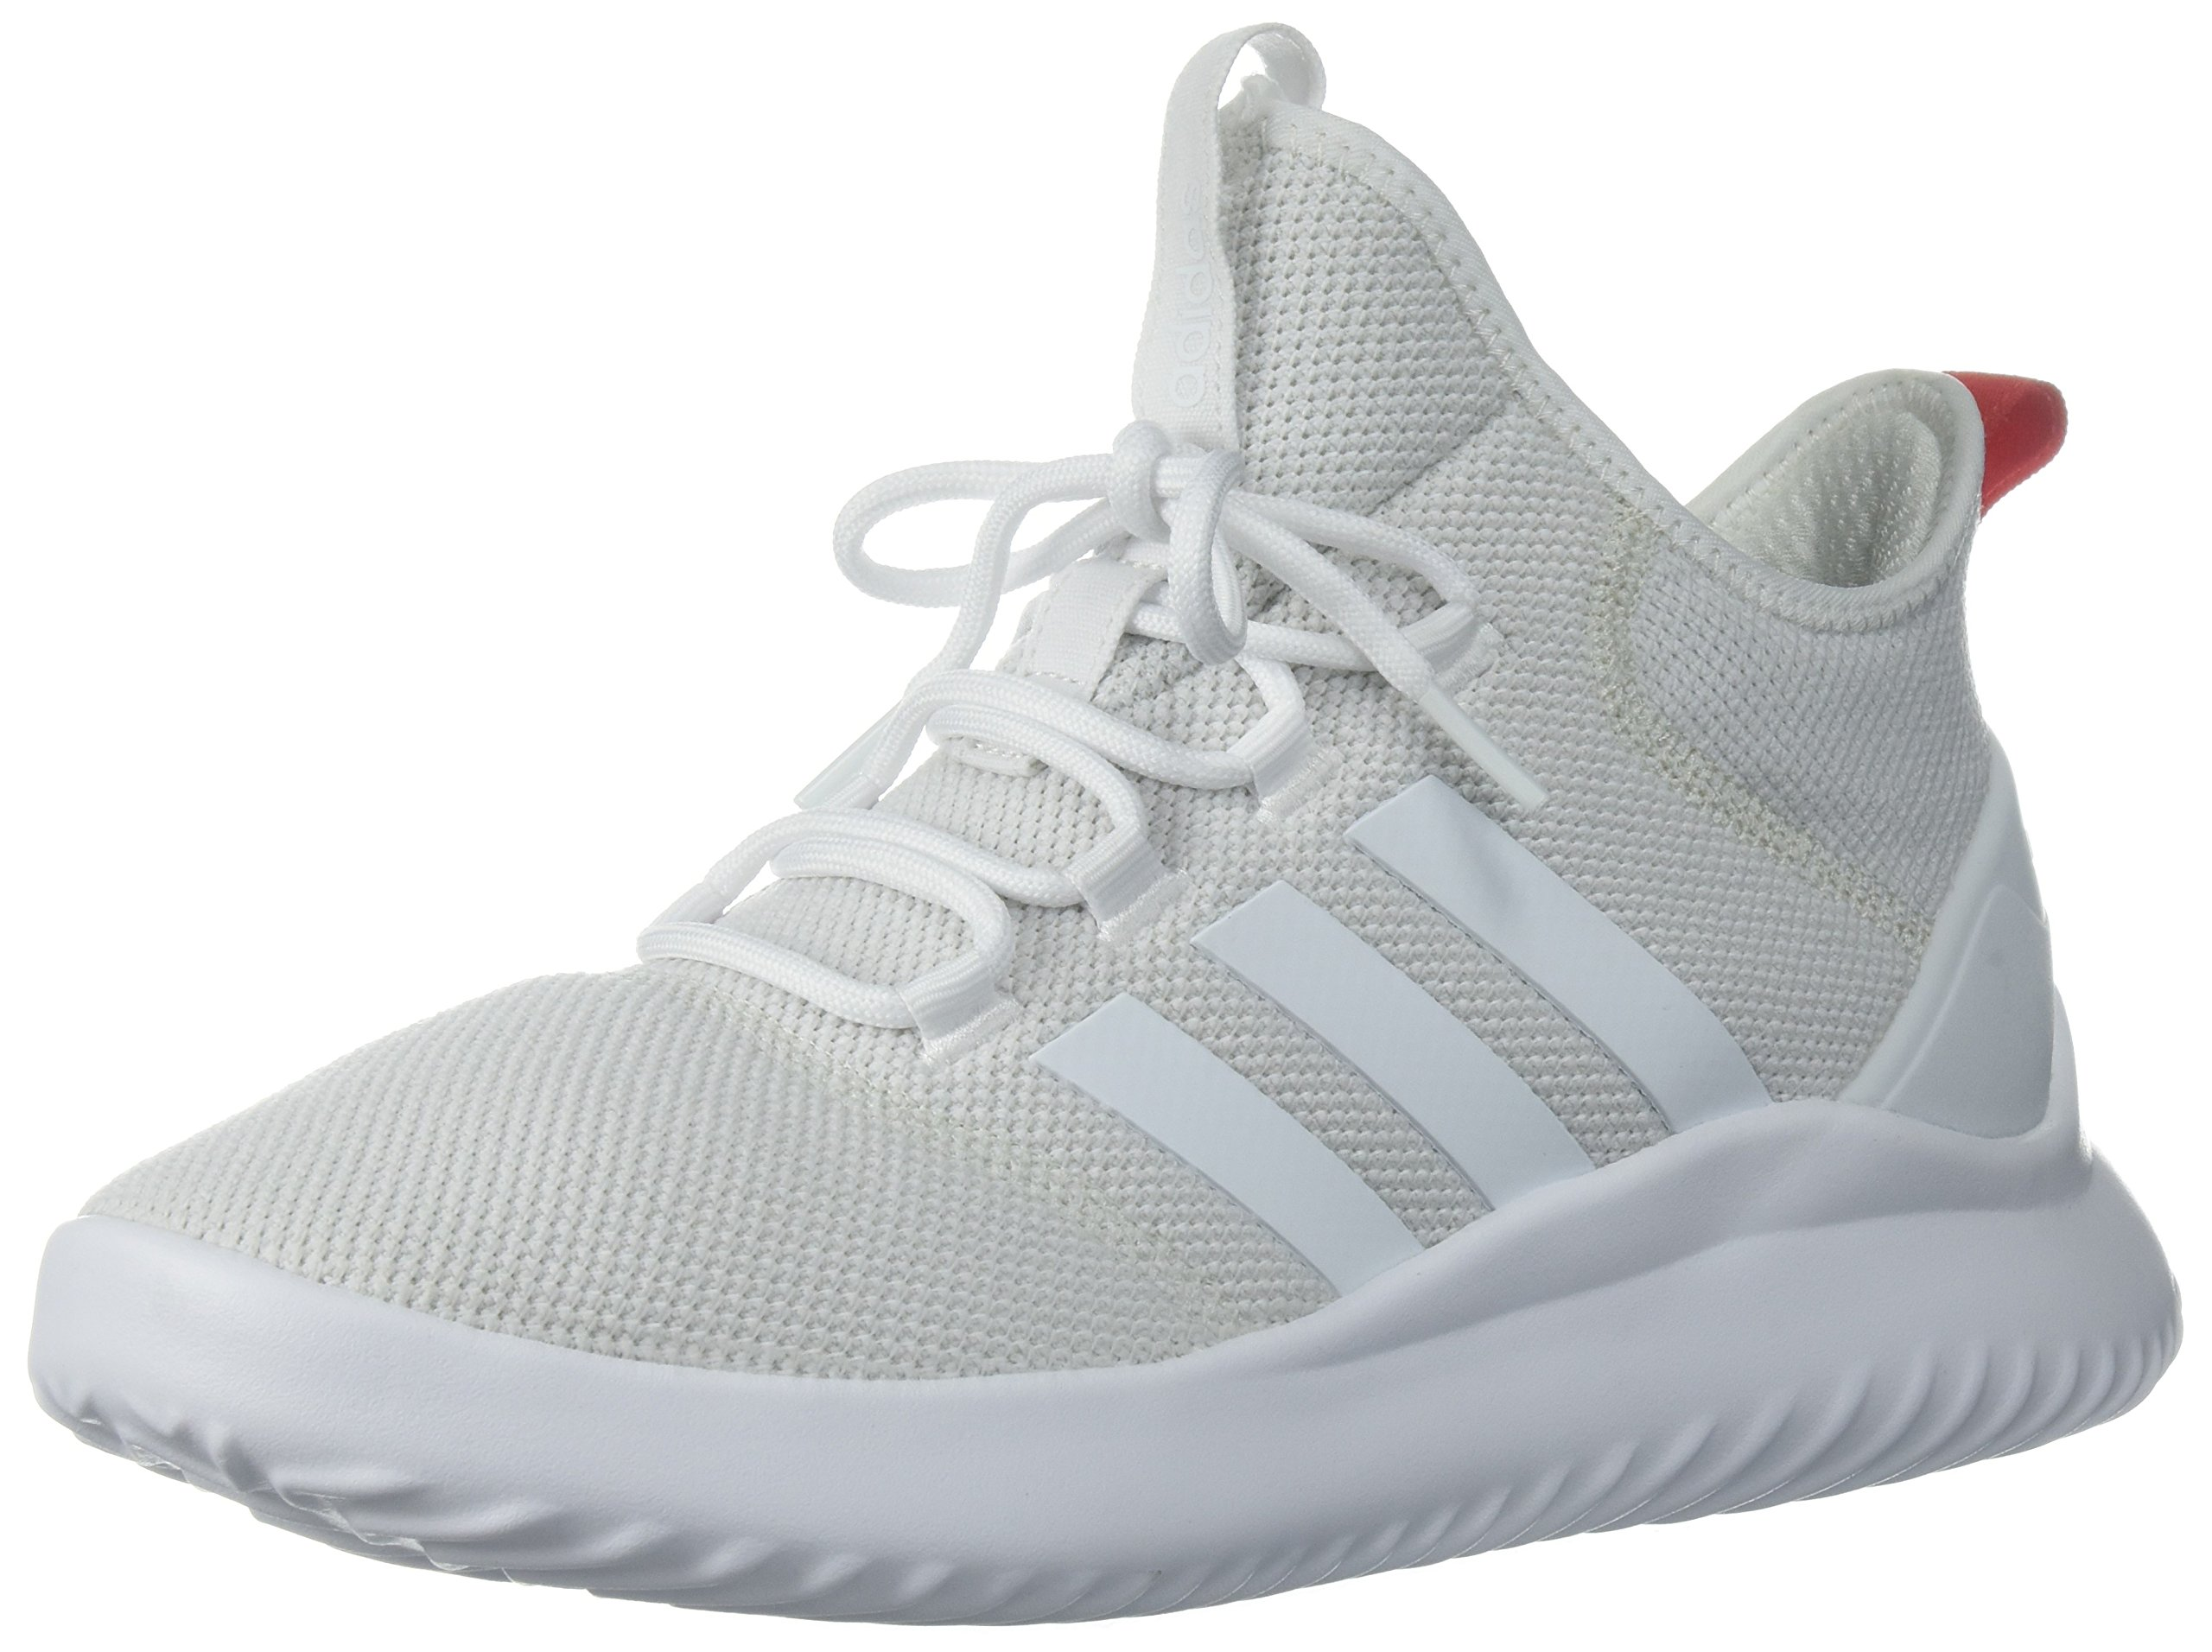 Adidas Men's CF Ultimate Bball, White